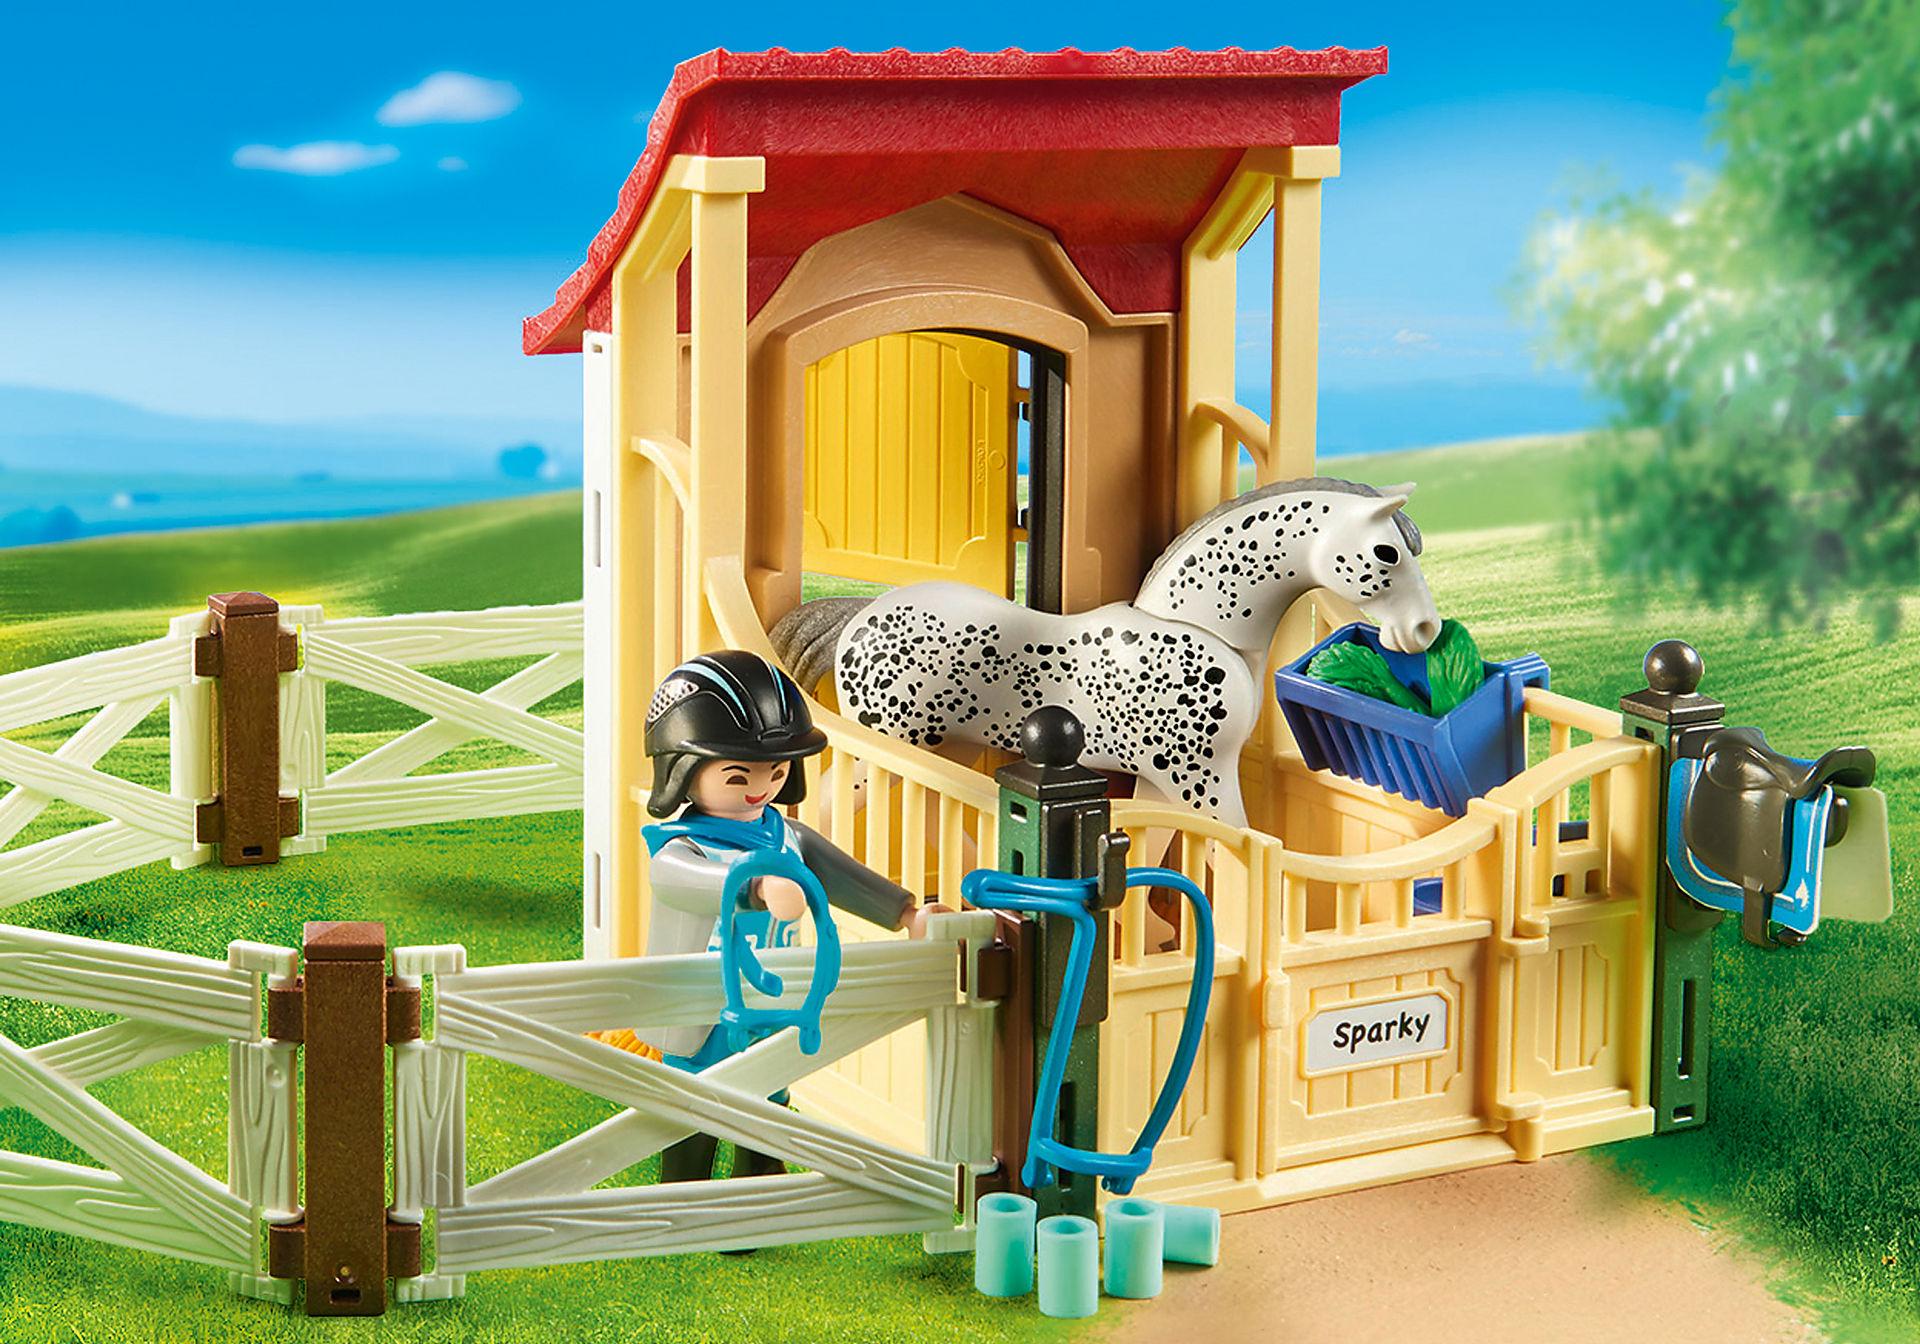 http://media.playmobil.com/i/playmobil/6935_product_extra2/Appaloosa met paardenbox